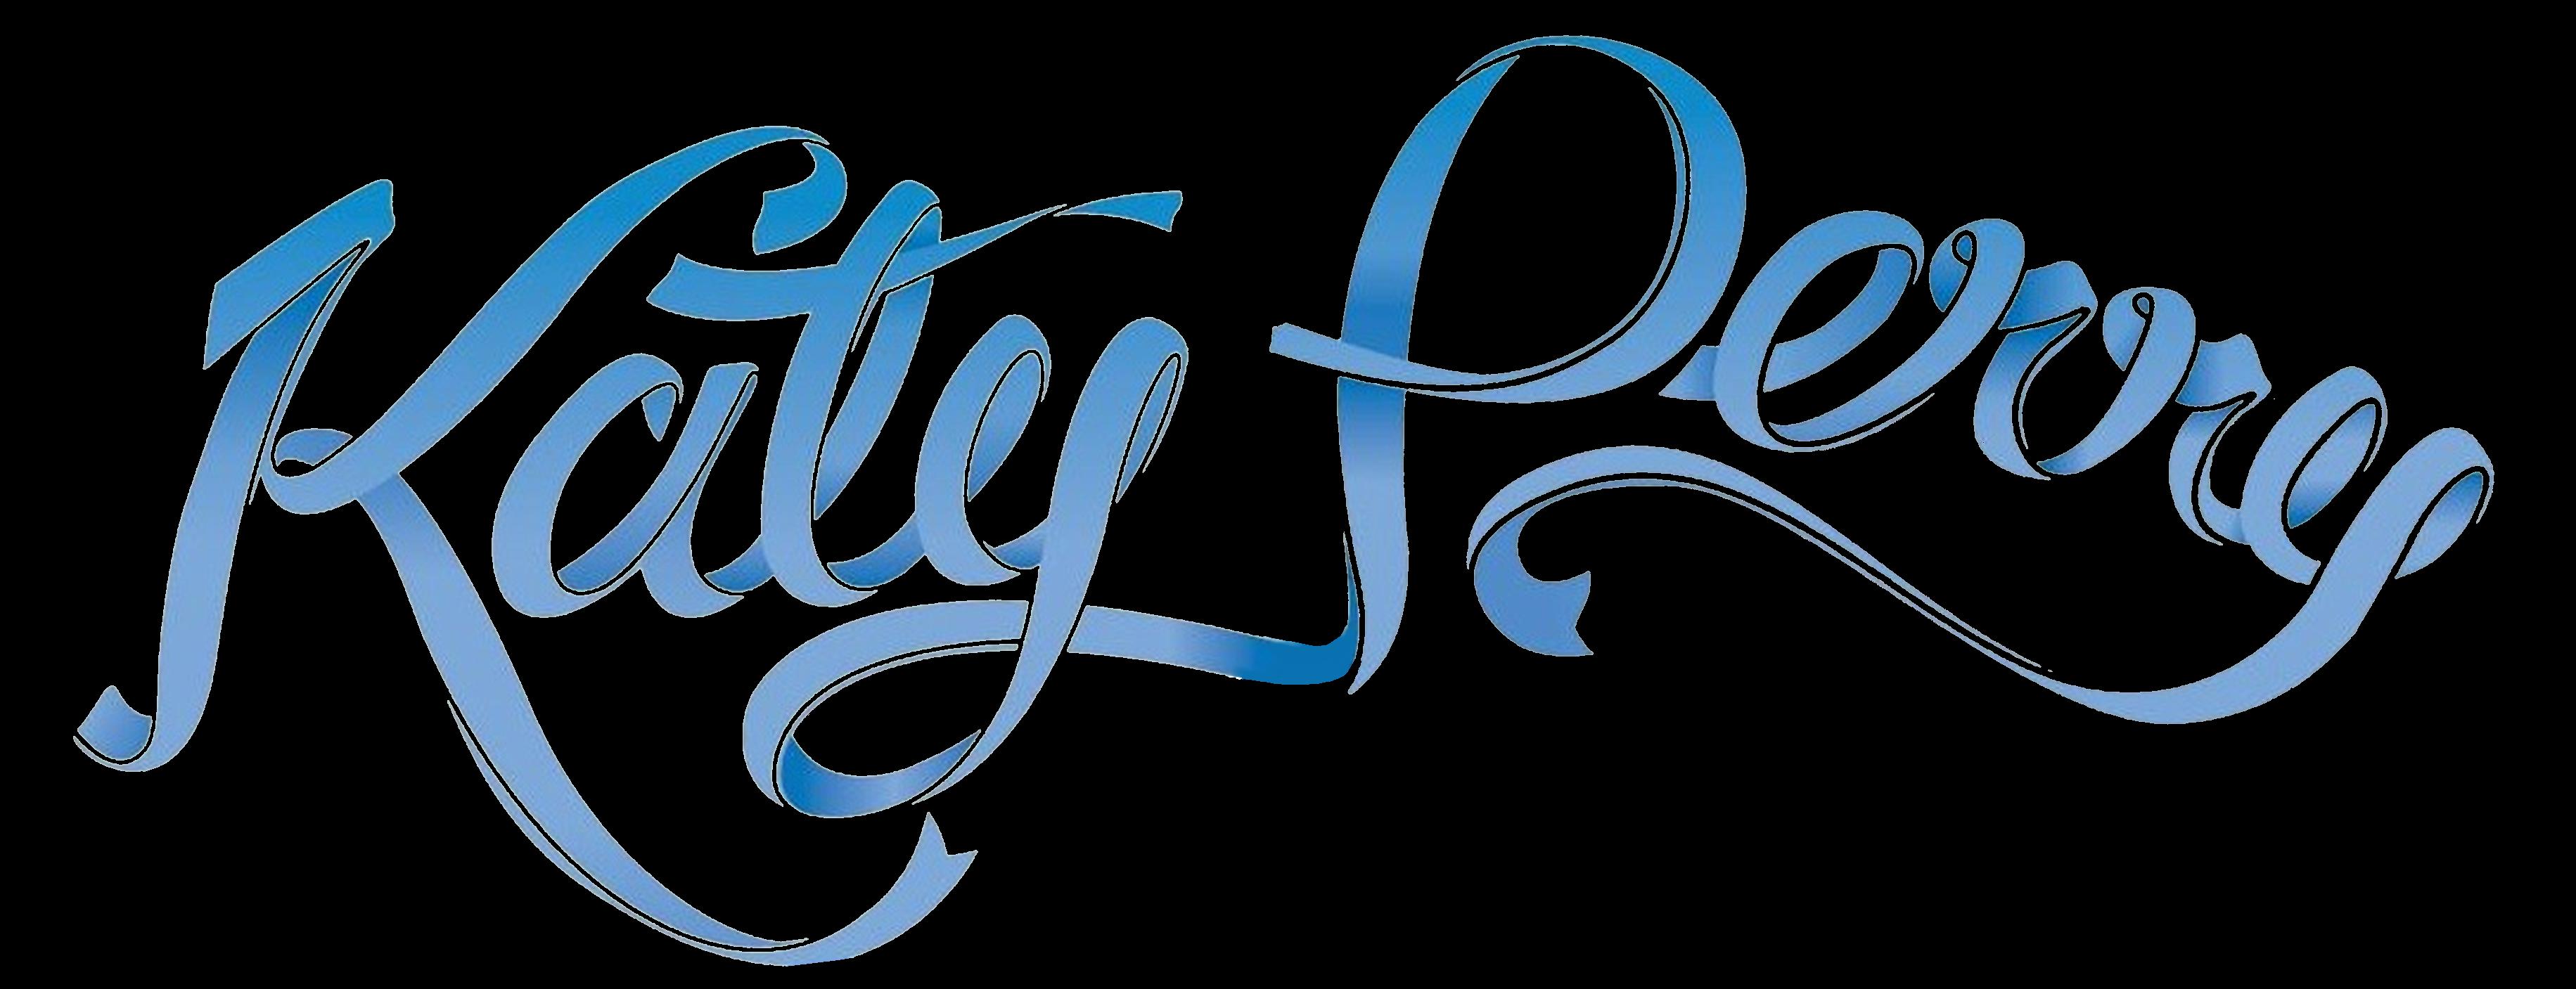 Katy Perry Prism Logo Font